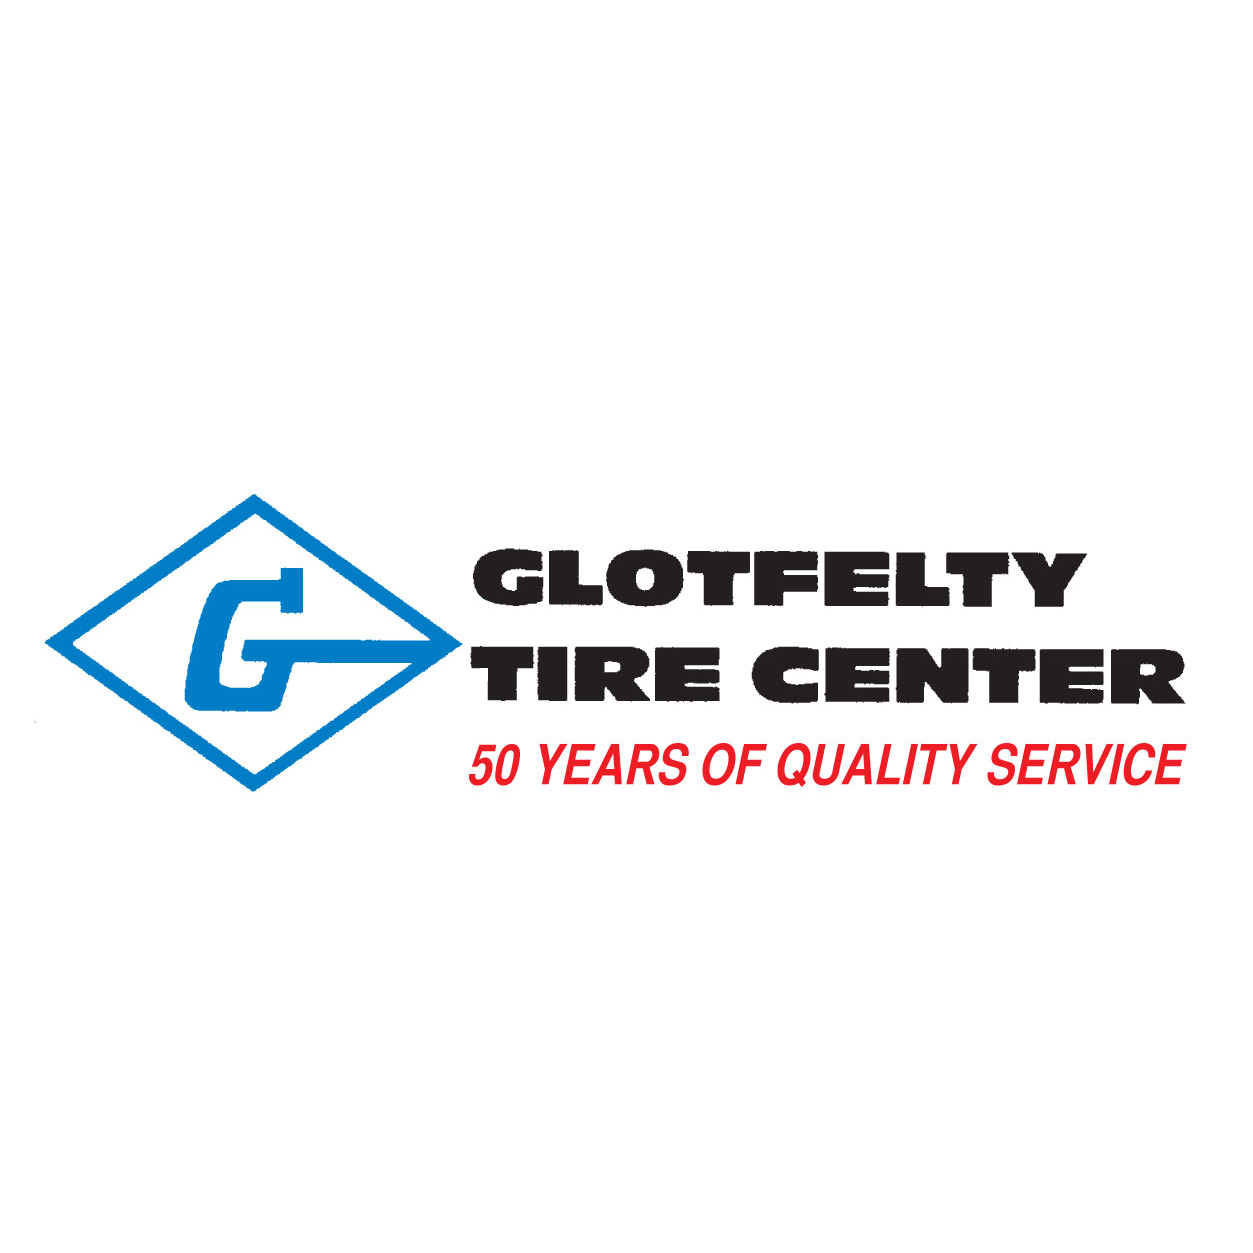 Glotfelty Tire Center